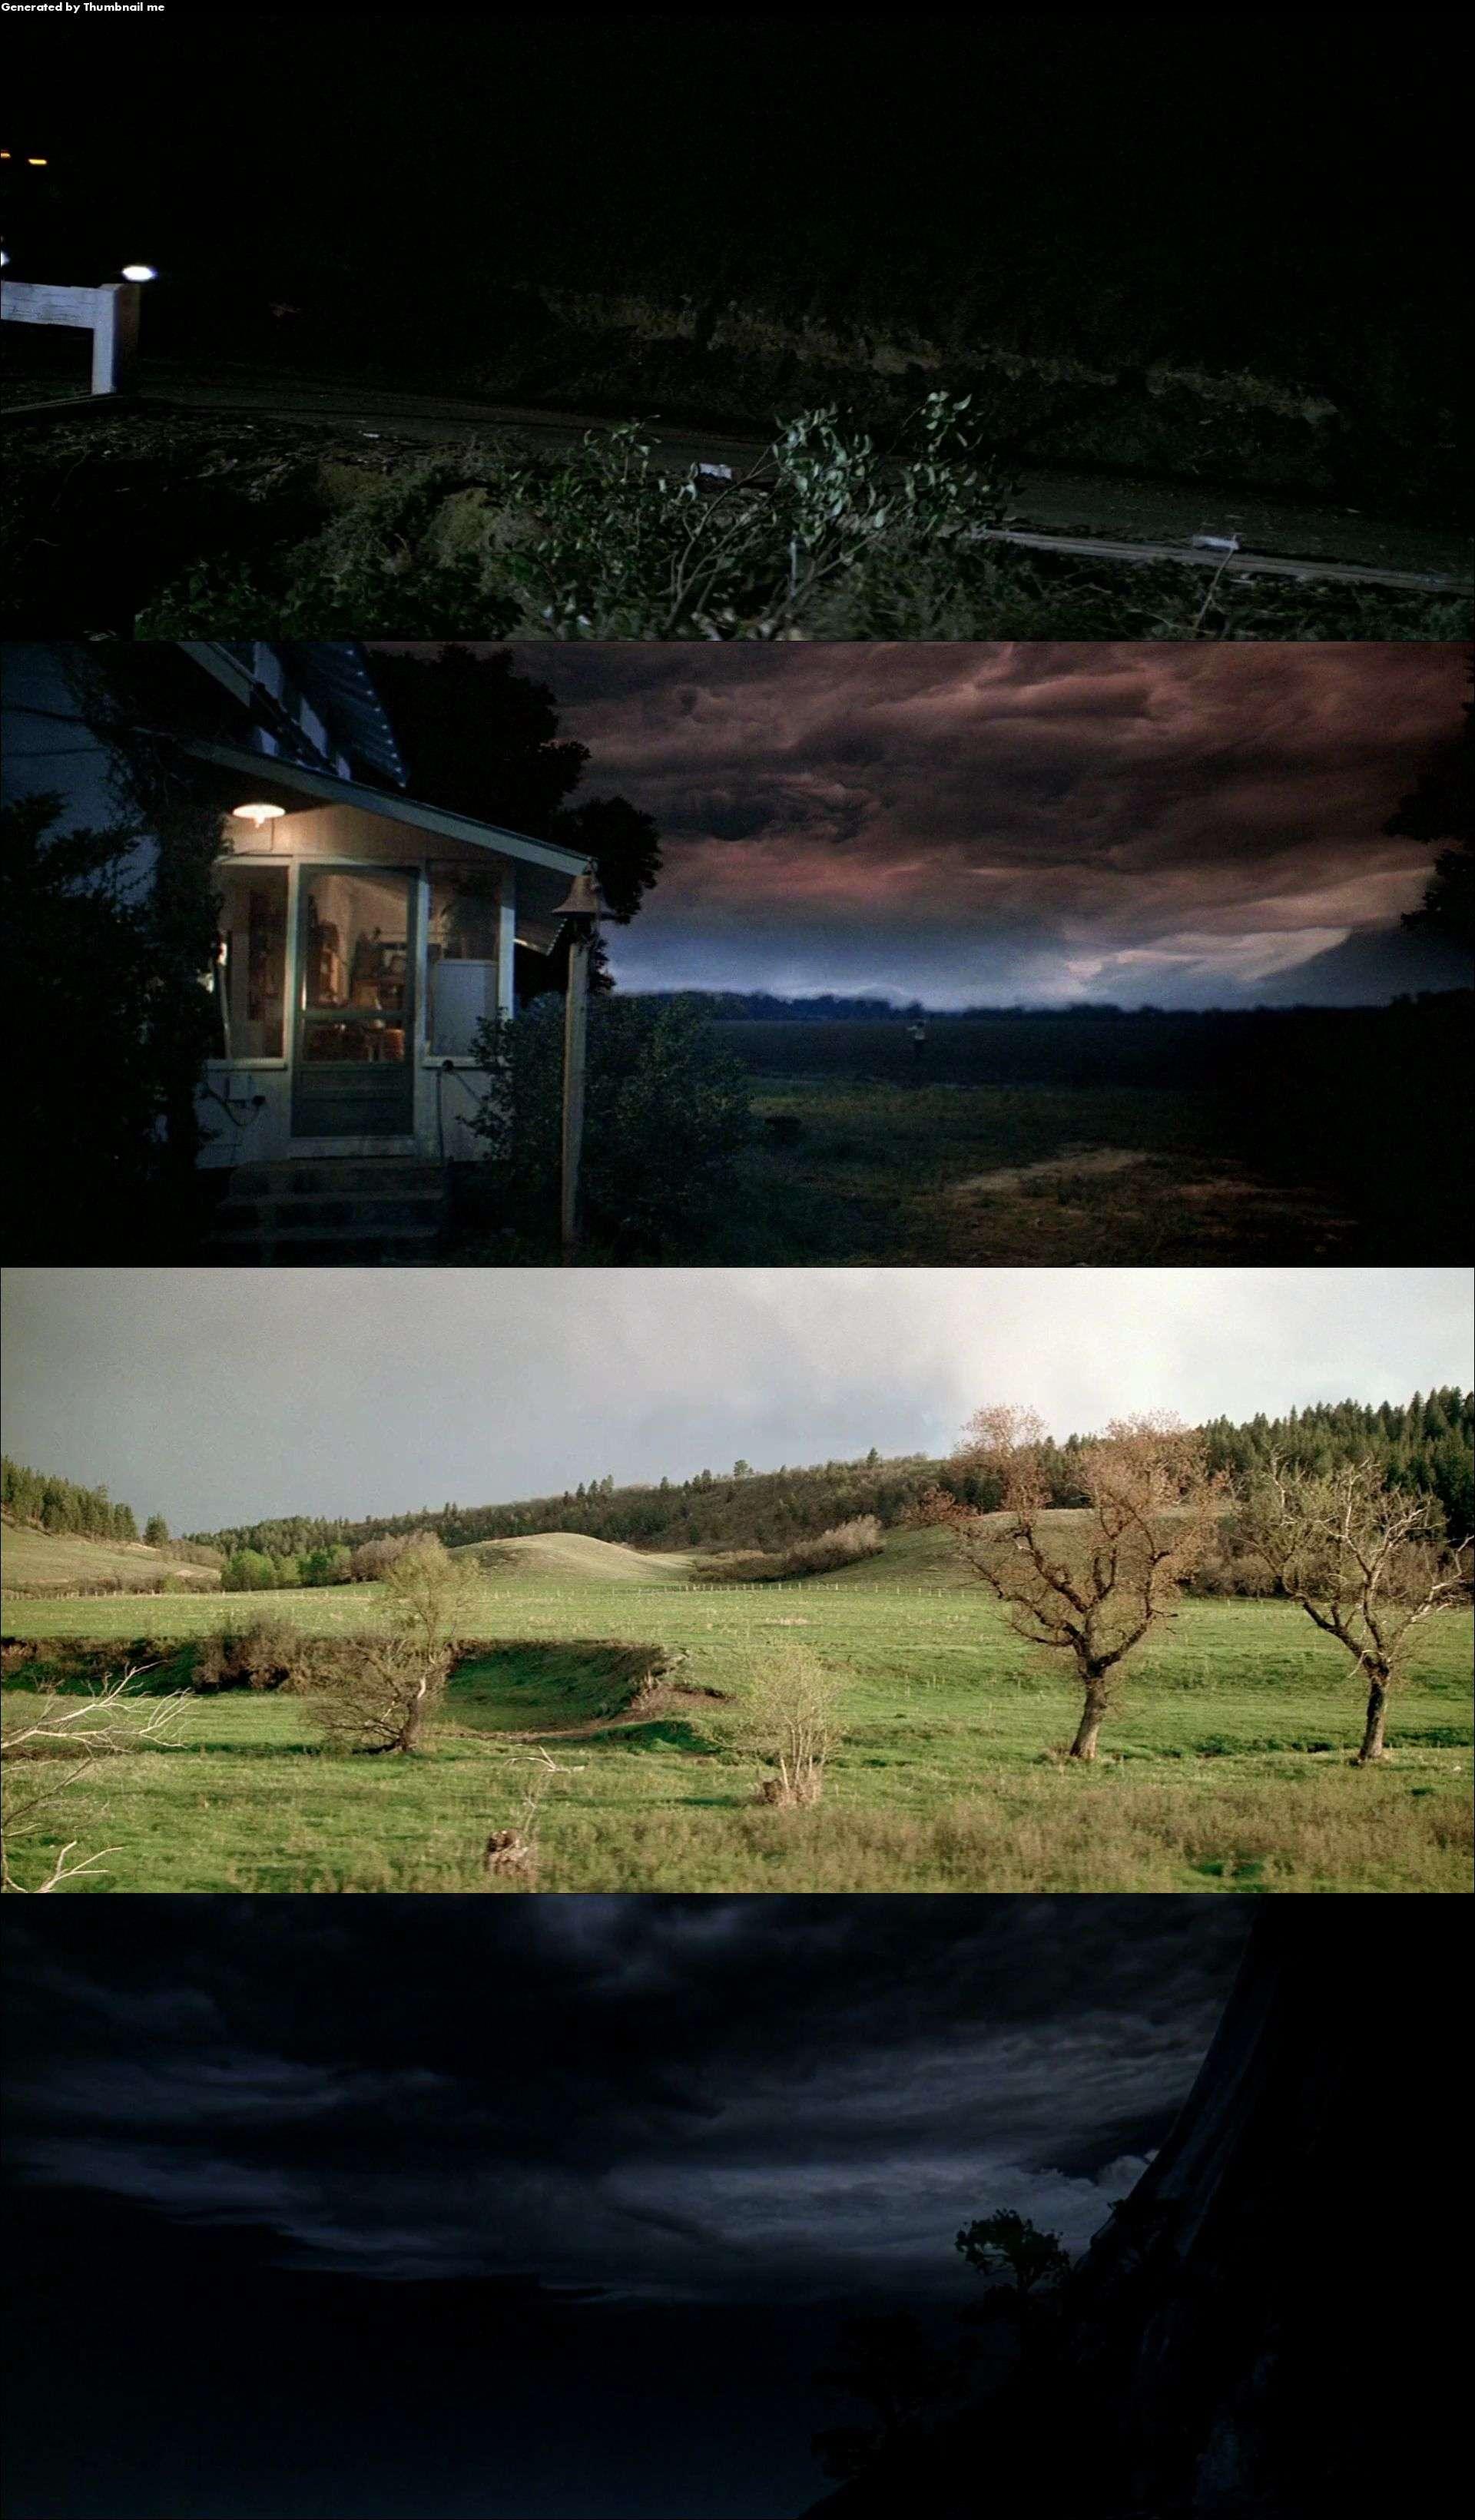 Üçüncü Türden Yakınlaşmalar - Close Encounters of the Third Kind (1977) türkçe dublaj film indir